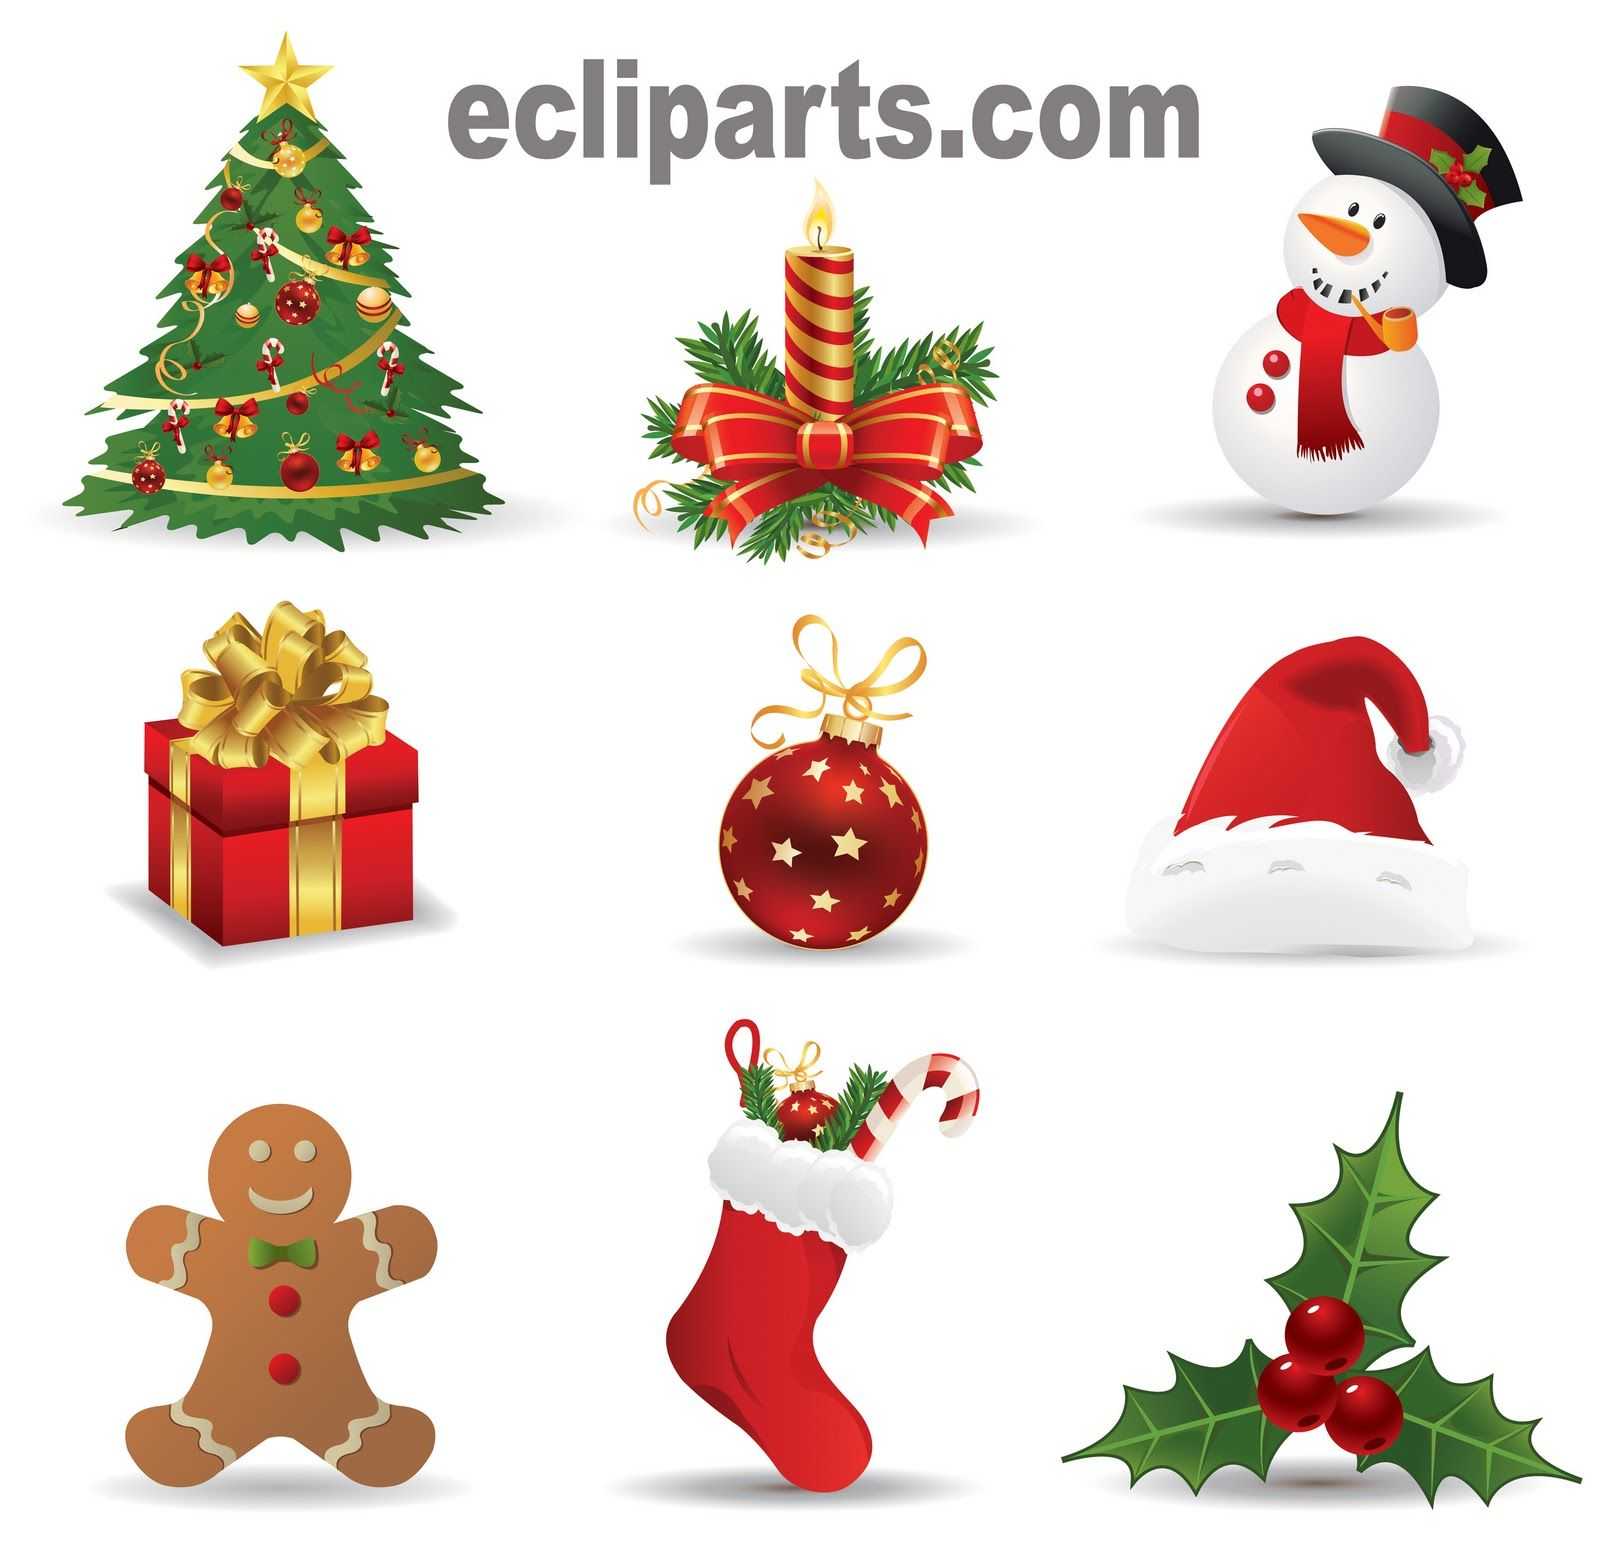 Free Clip Art Christmas Image Free Clip Arts Happy Christmas Clip Art Christmas Clipart Free Christmas Clipart Christmas Tree With Presents